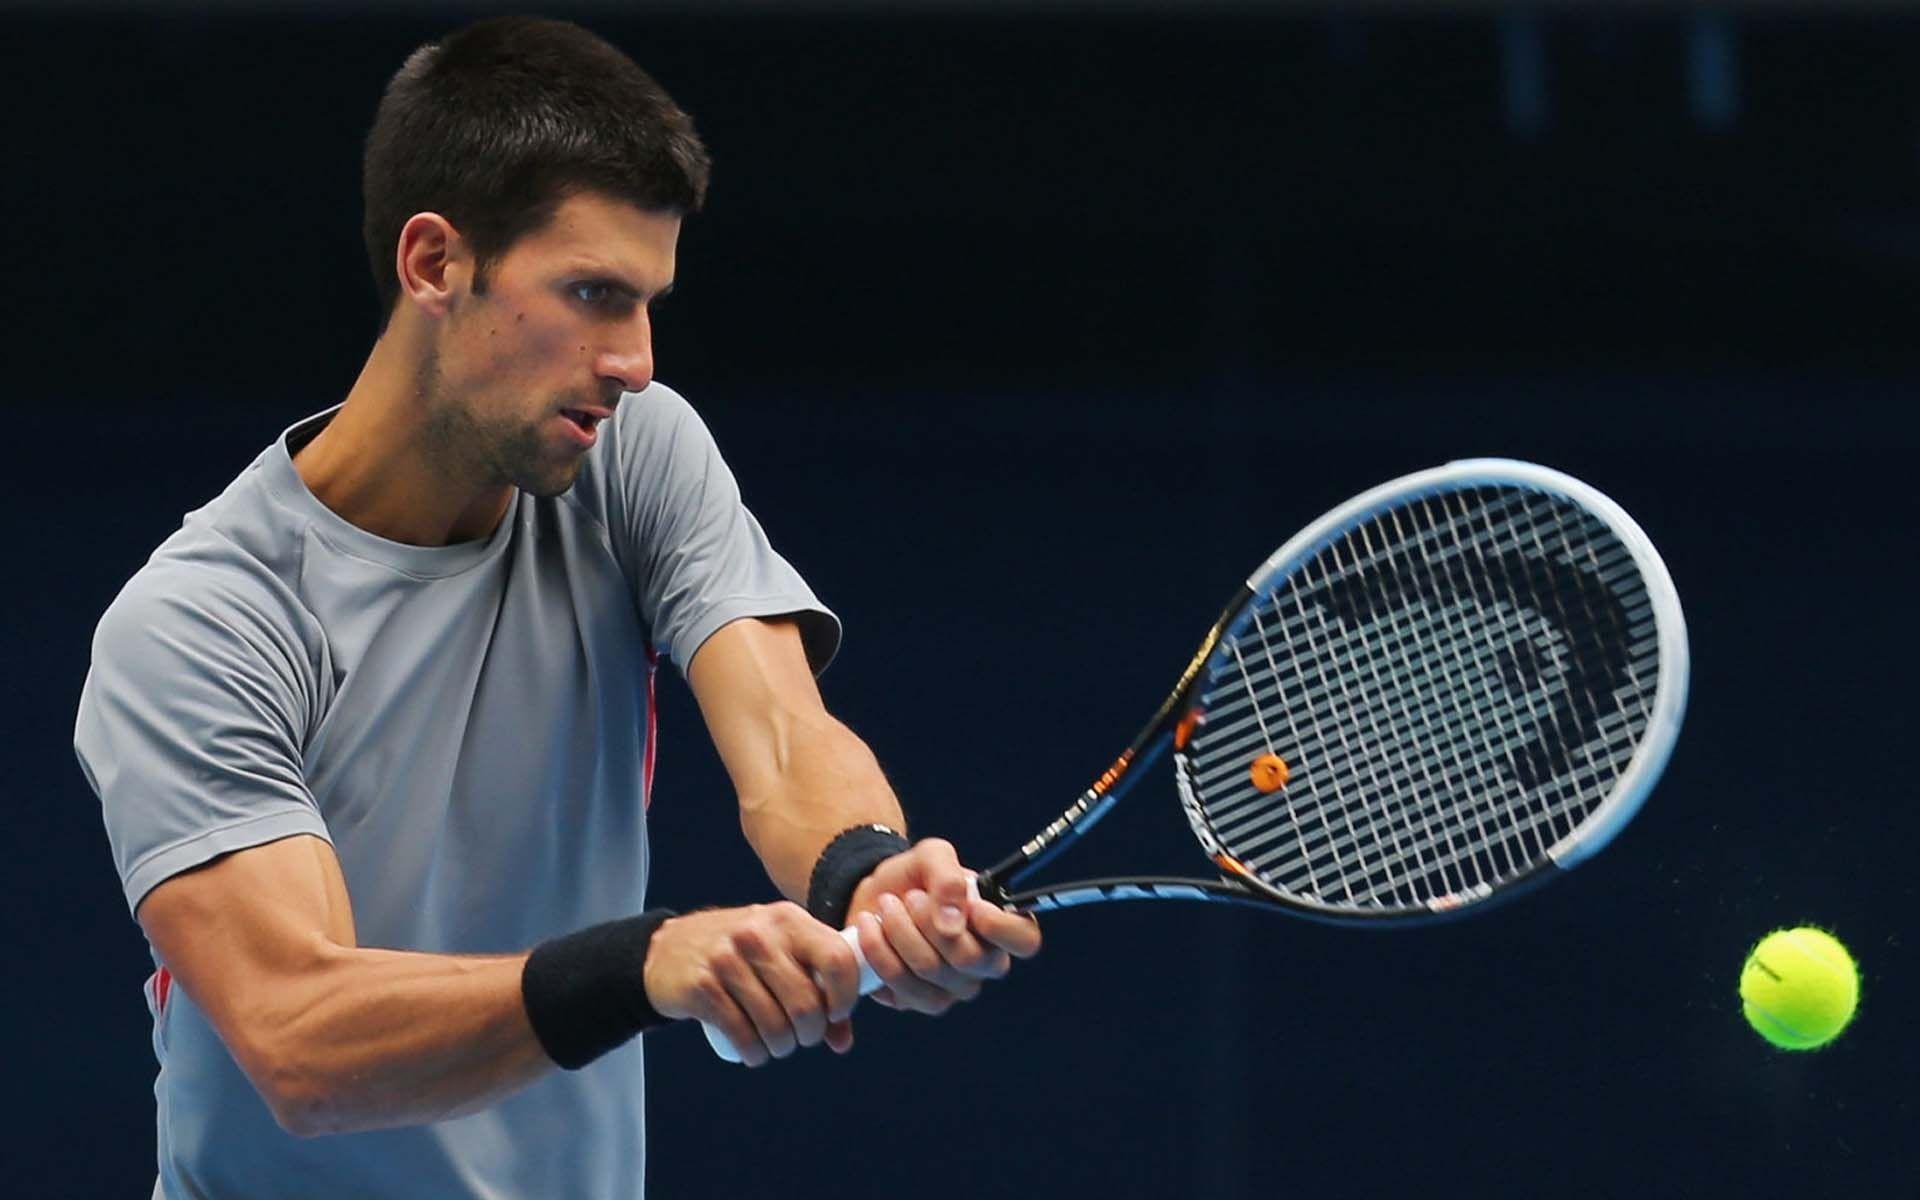 Novak Djokovic Backhand 9ine Novak Djokovic Tennis Wallpaper Celebrity Wallpapers